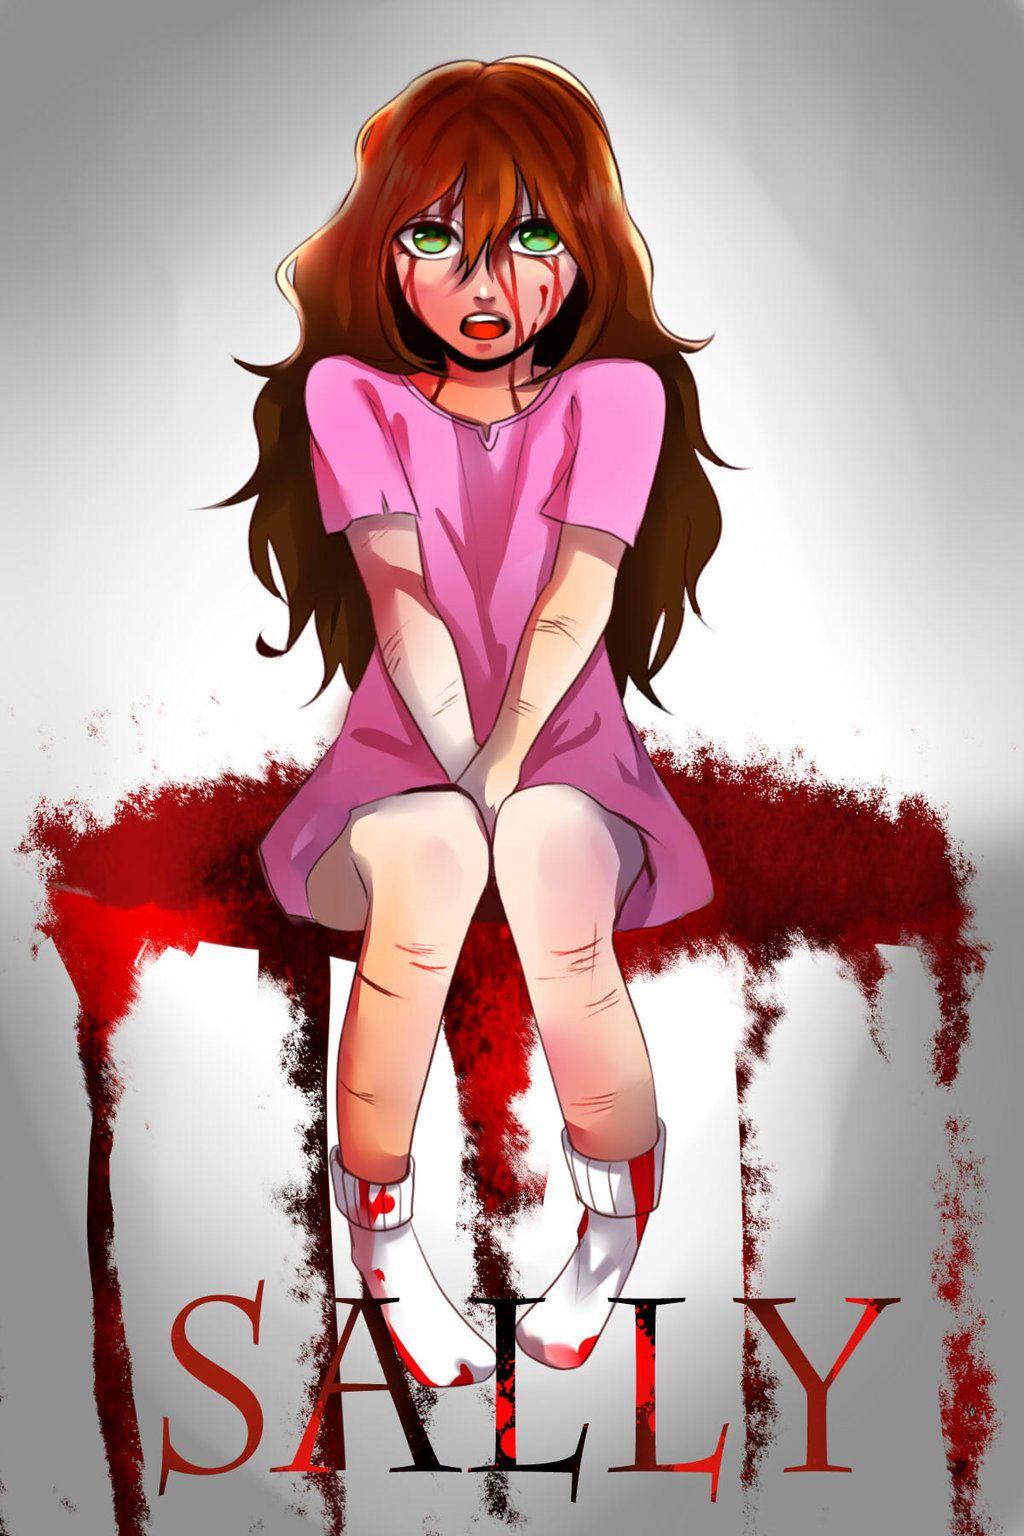 Sally Williams Edit Come Play With Me Anime Creepypasta